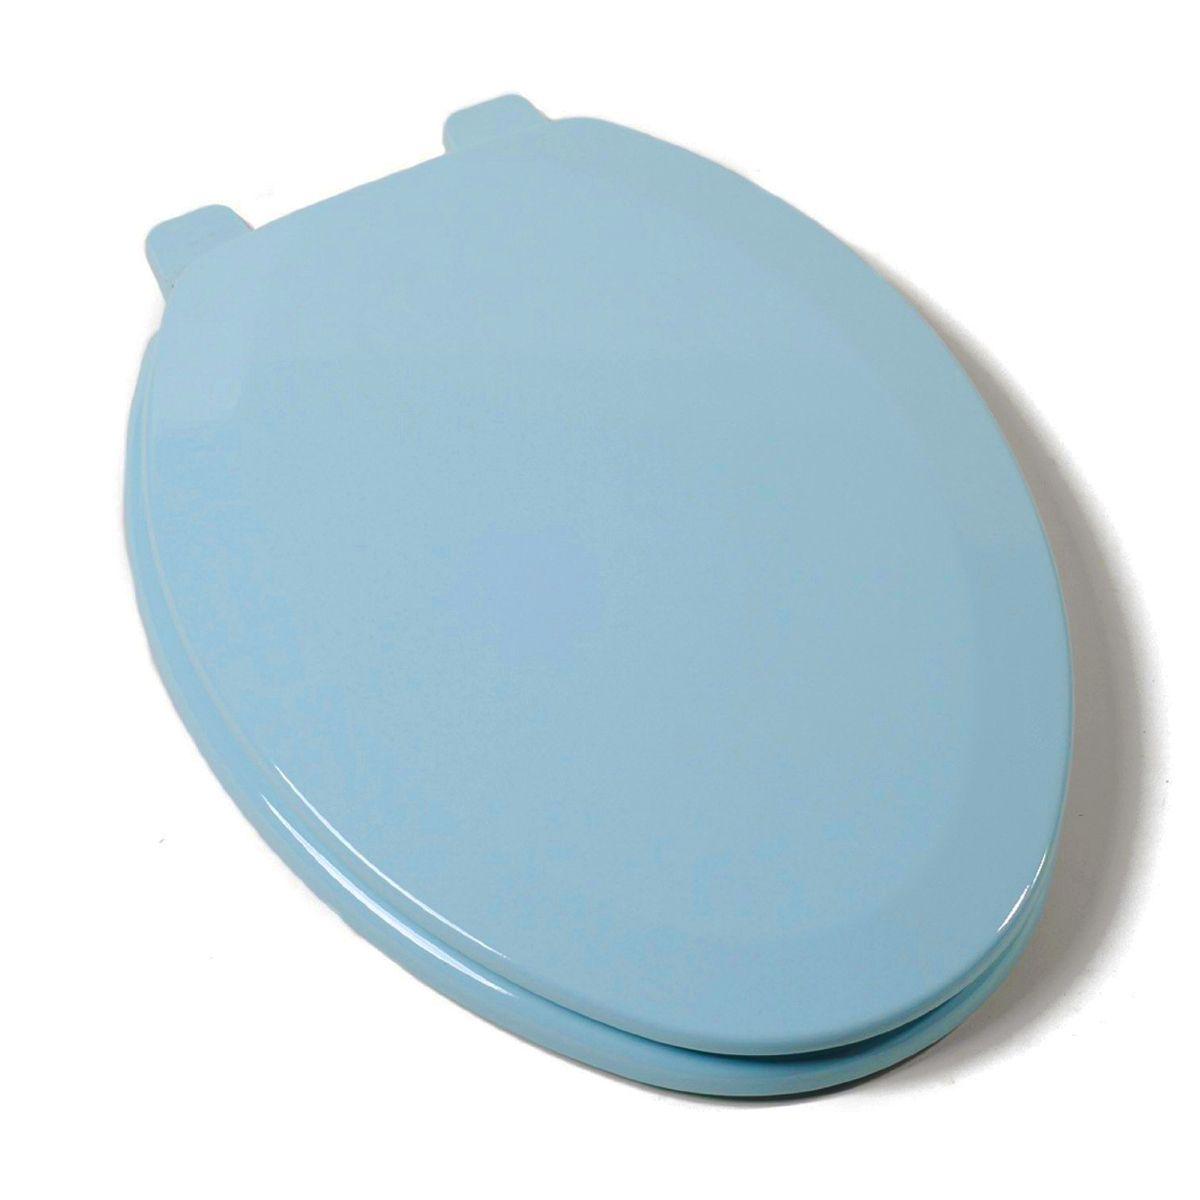 Deluxe Molded Wood Elongated Toilet Seat Regency Blue